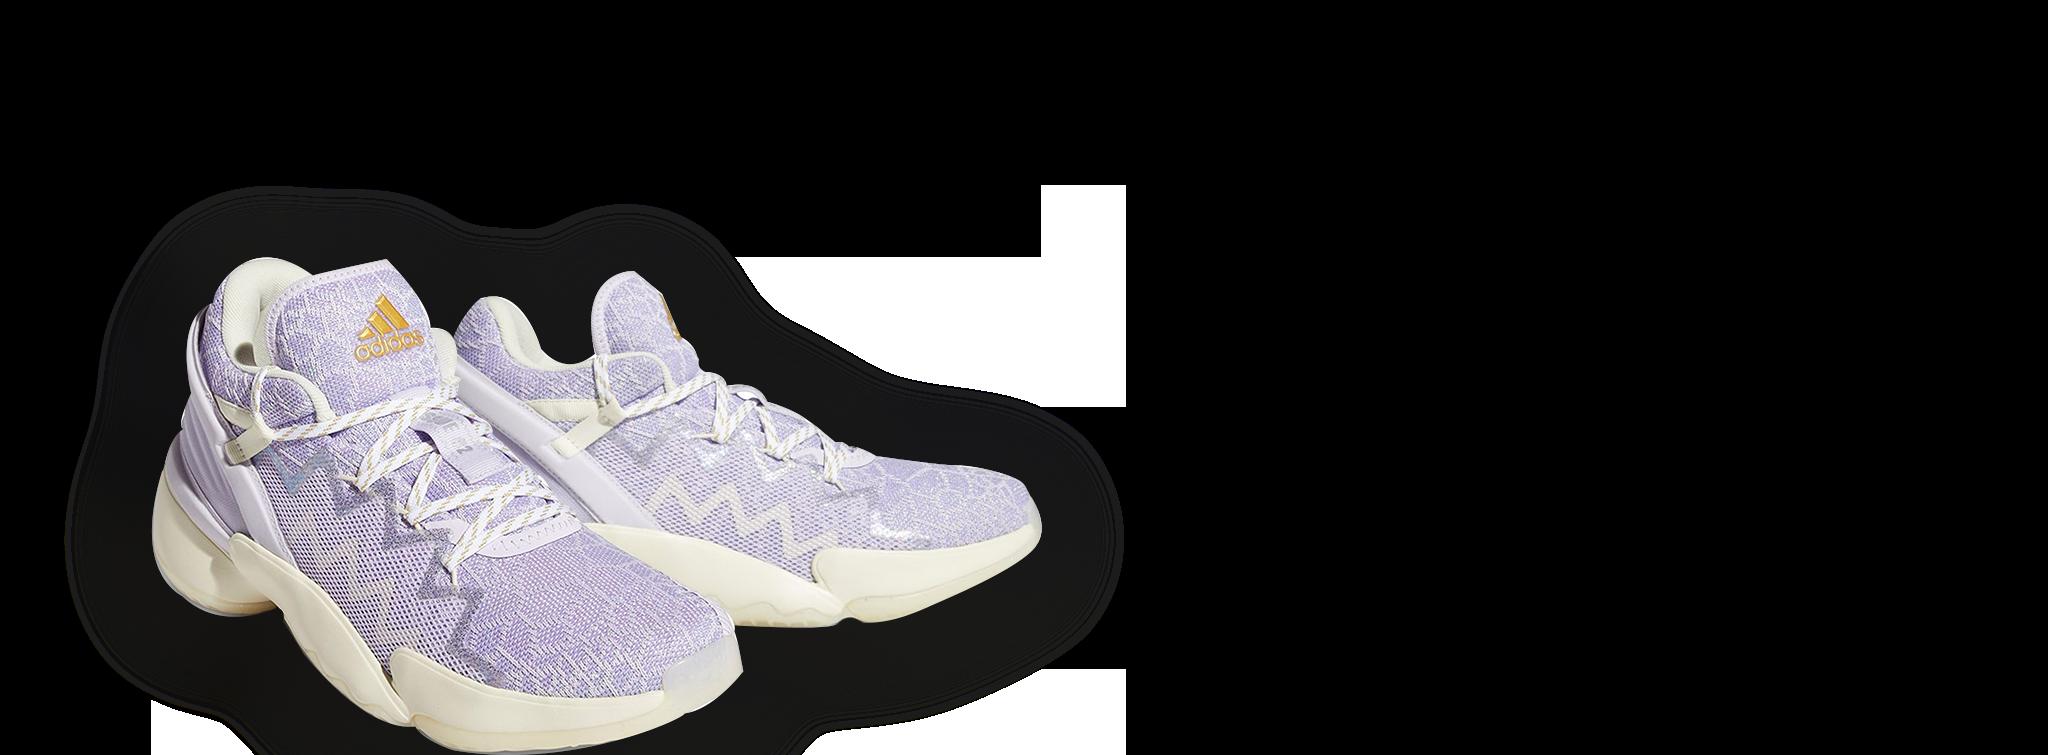 scarpe-19